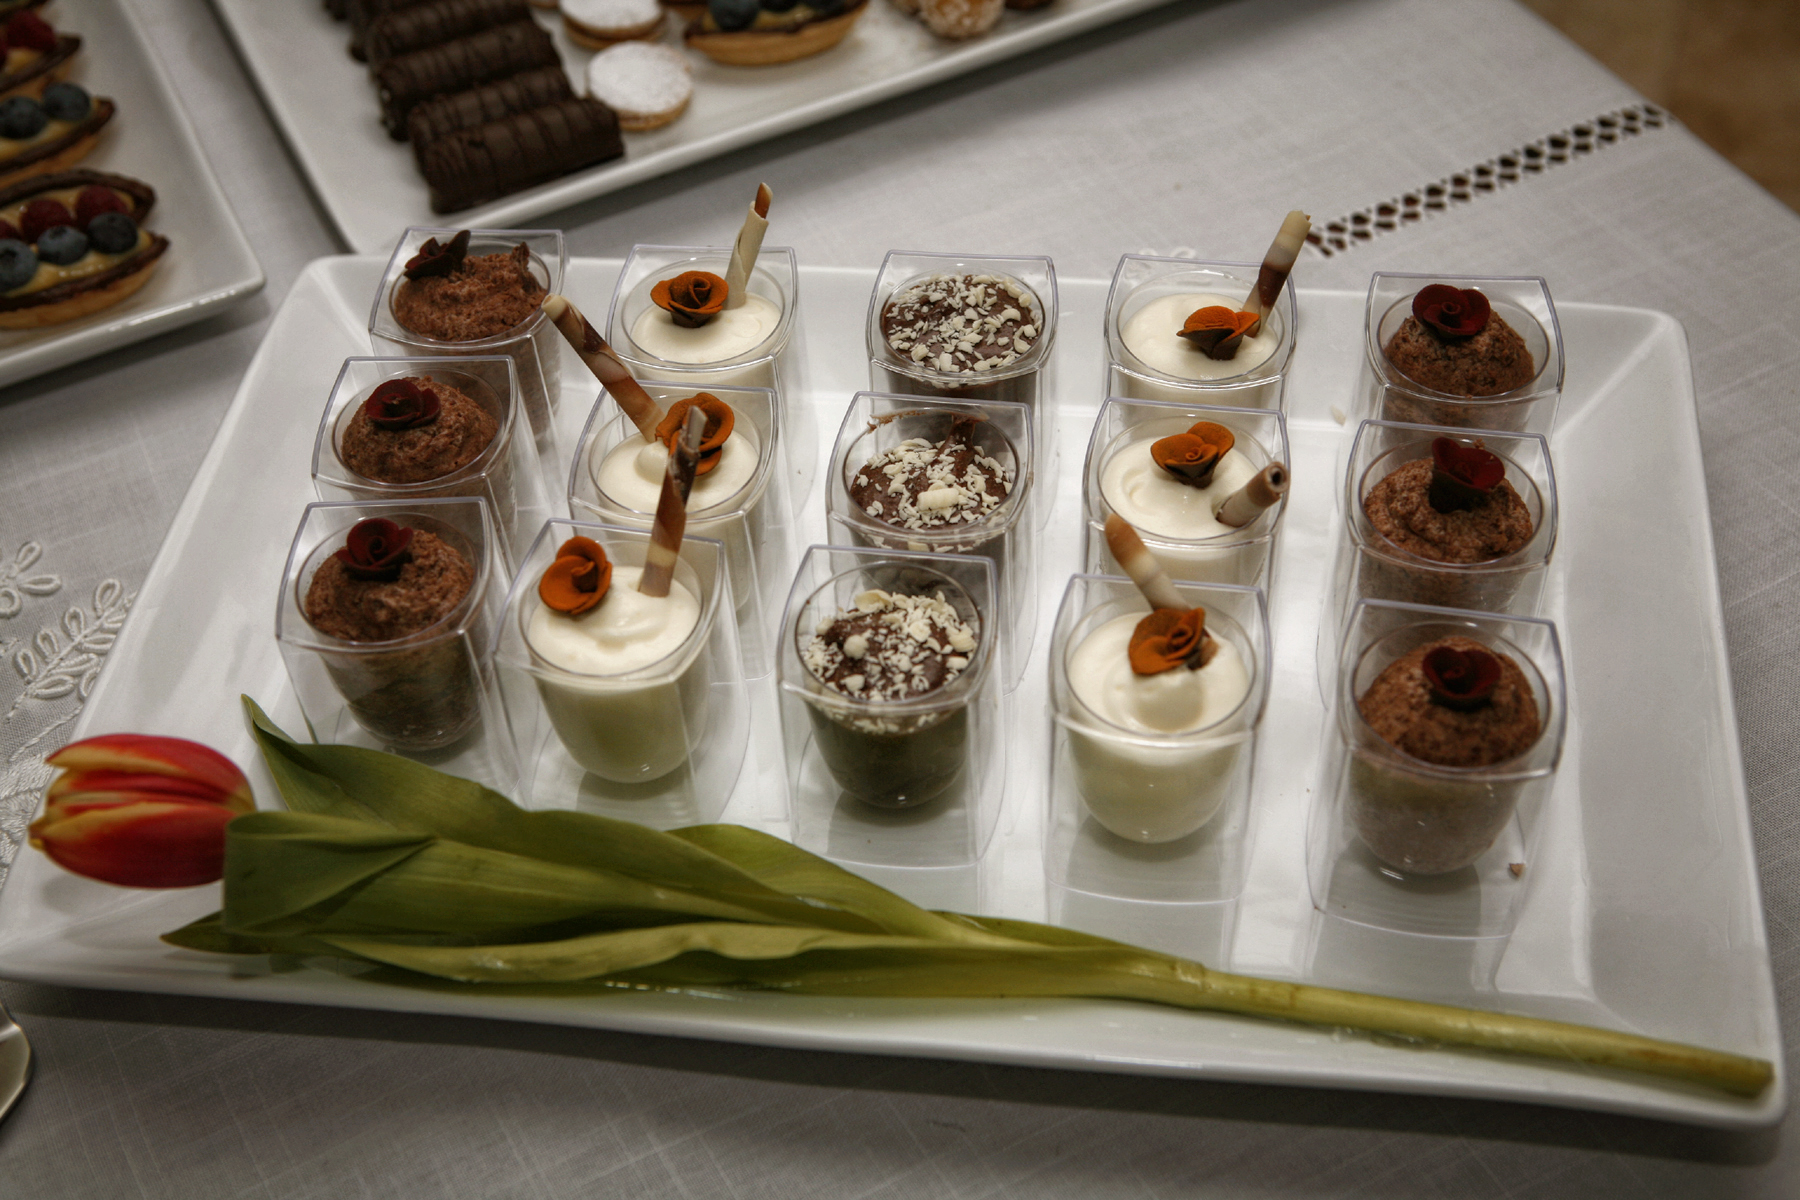 42-kosher-gourmet-desserts-high-end-event-photography.JPG